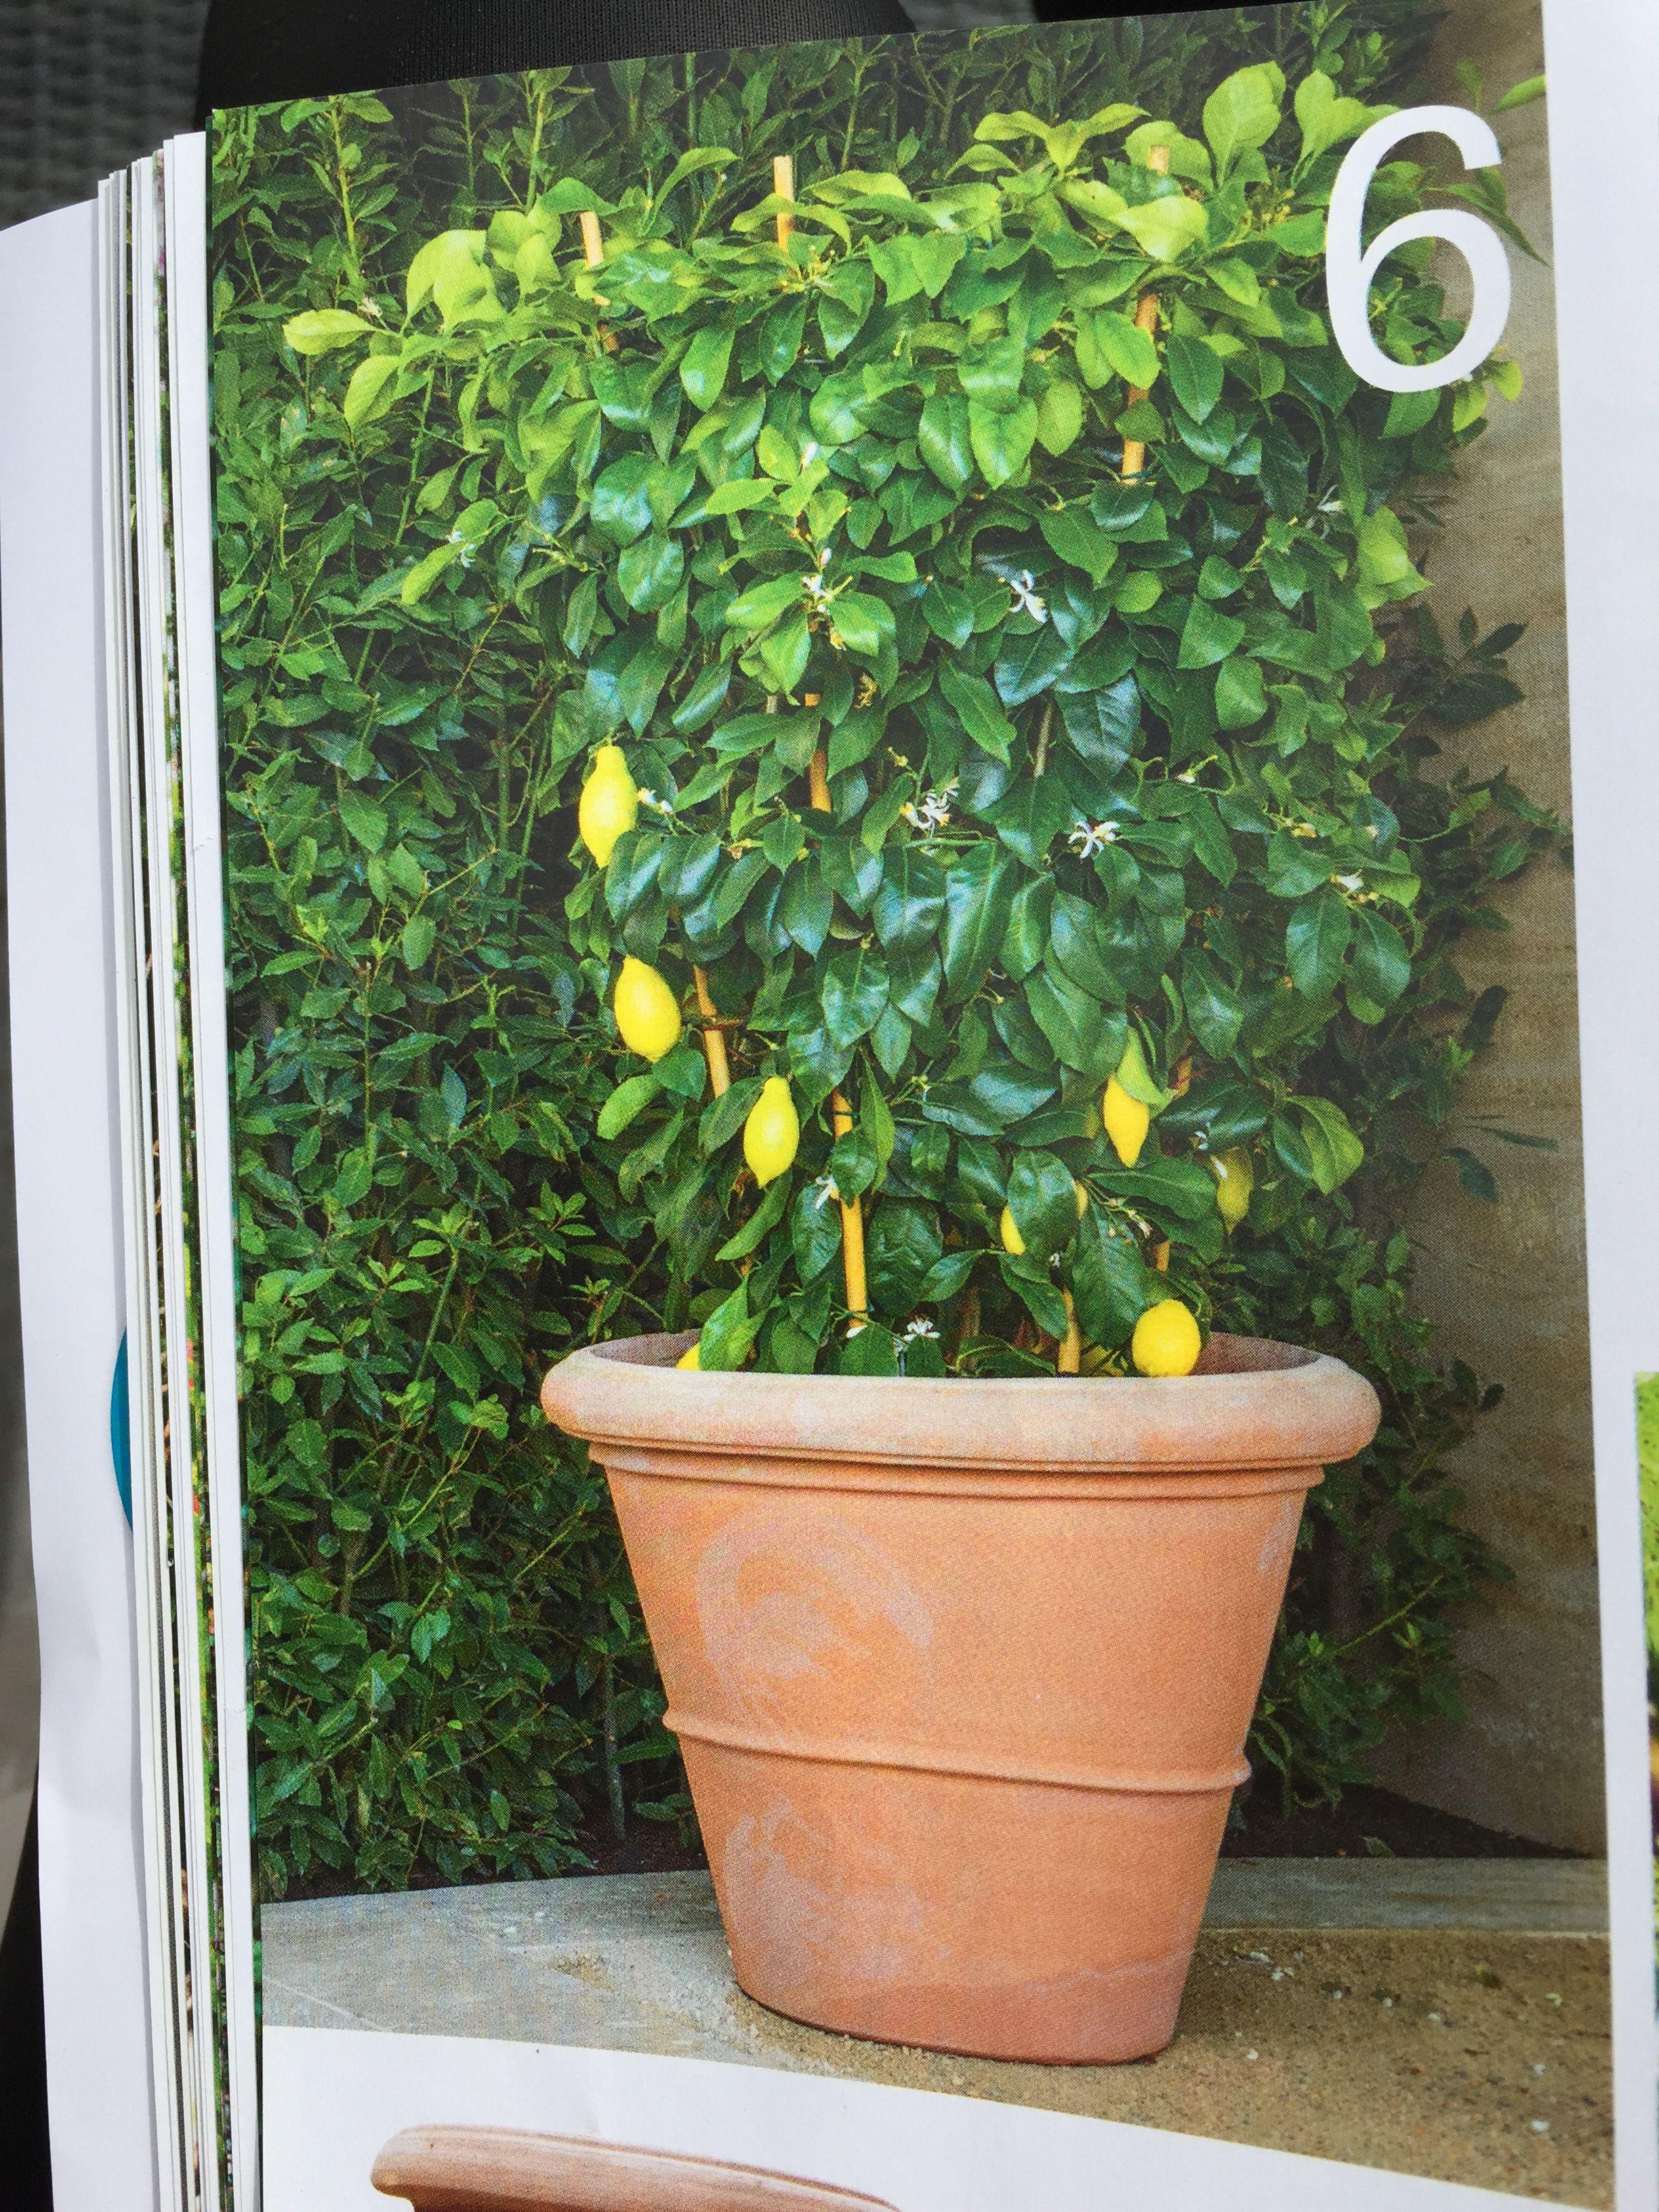 Mooie citroenplant tegen de muggen tegen steekmuggen for Vliegen in de tuin